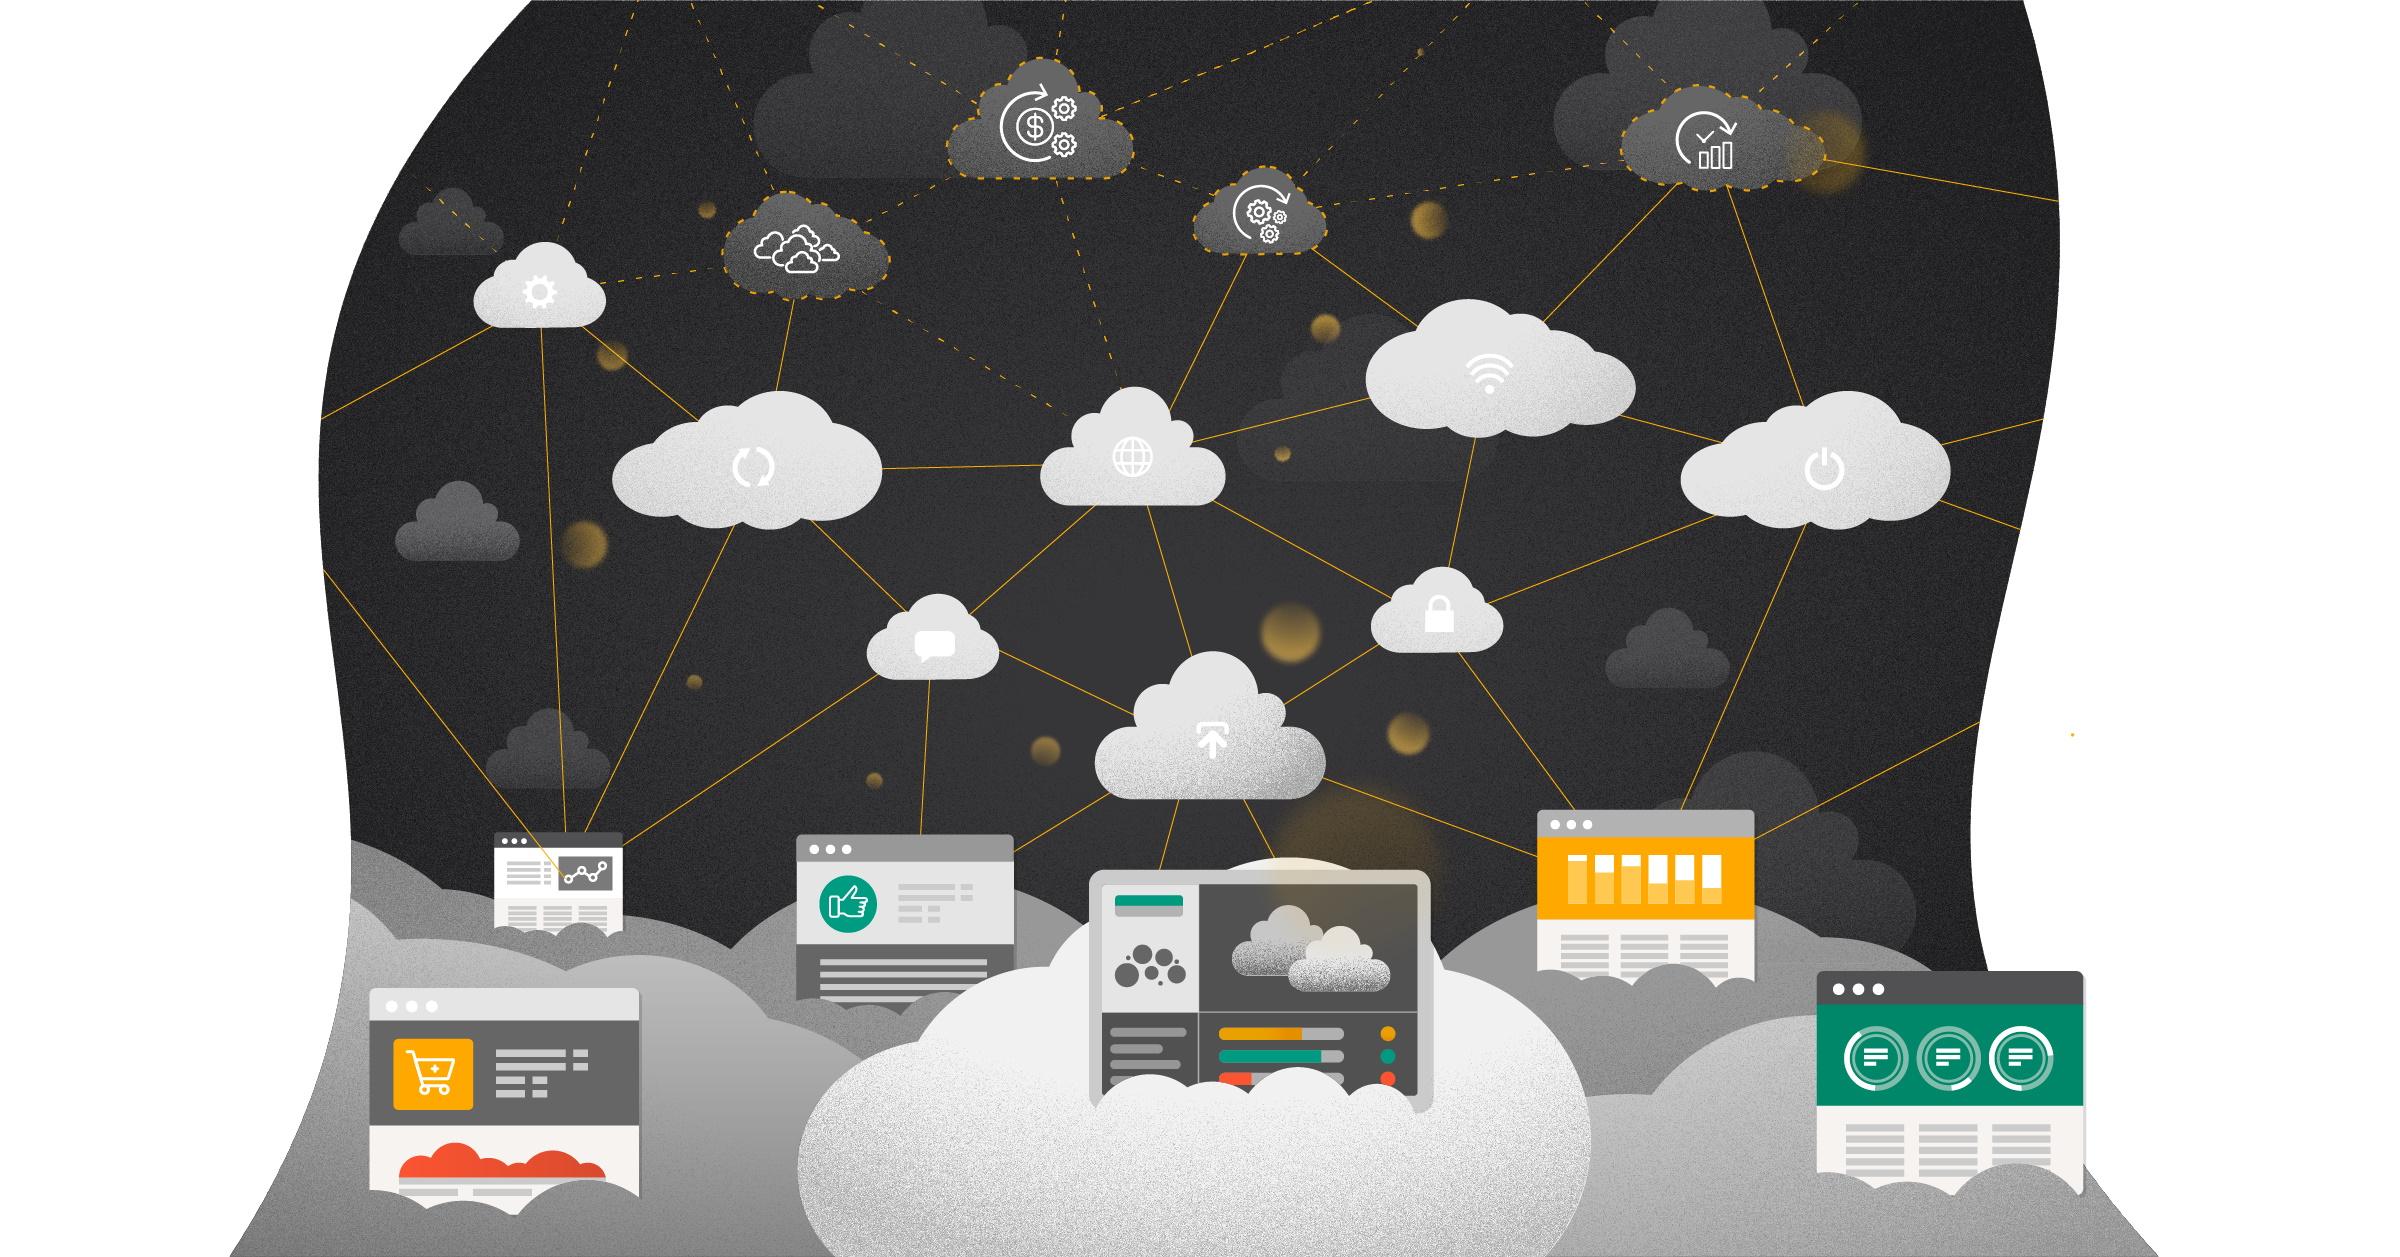 The long-term cloud architecture approach